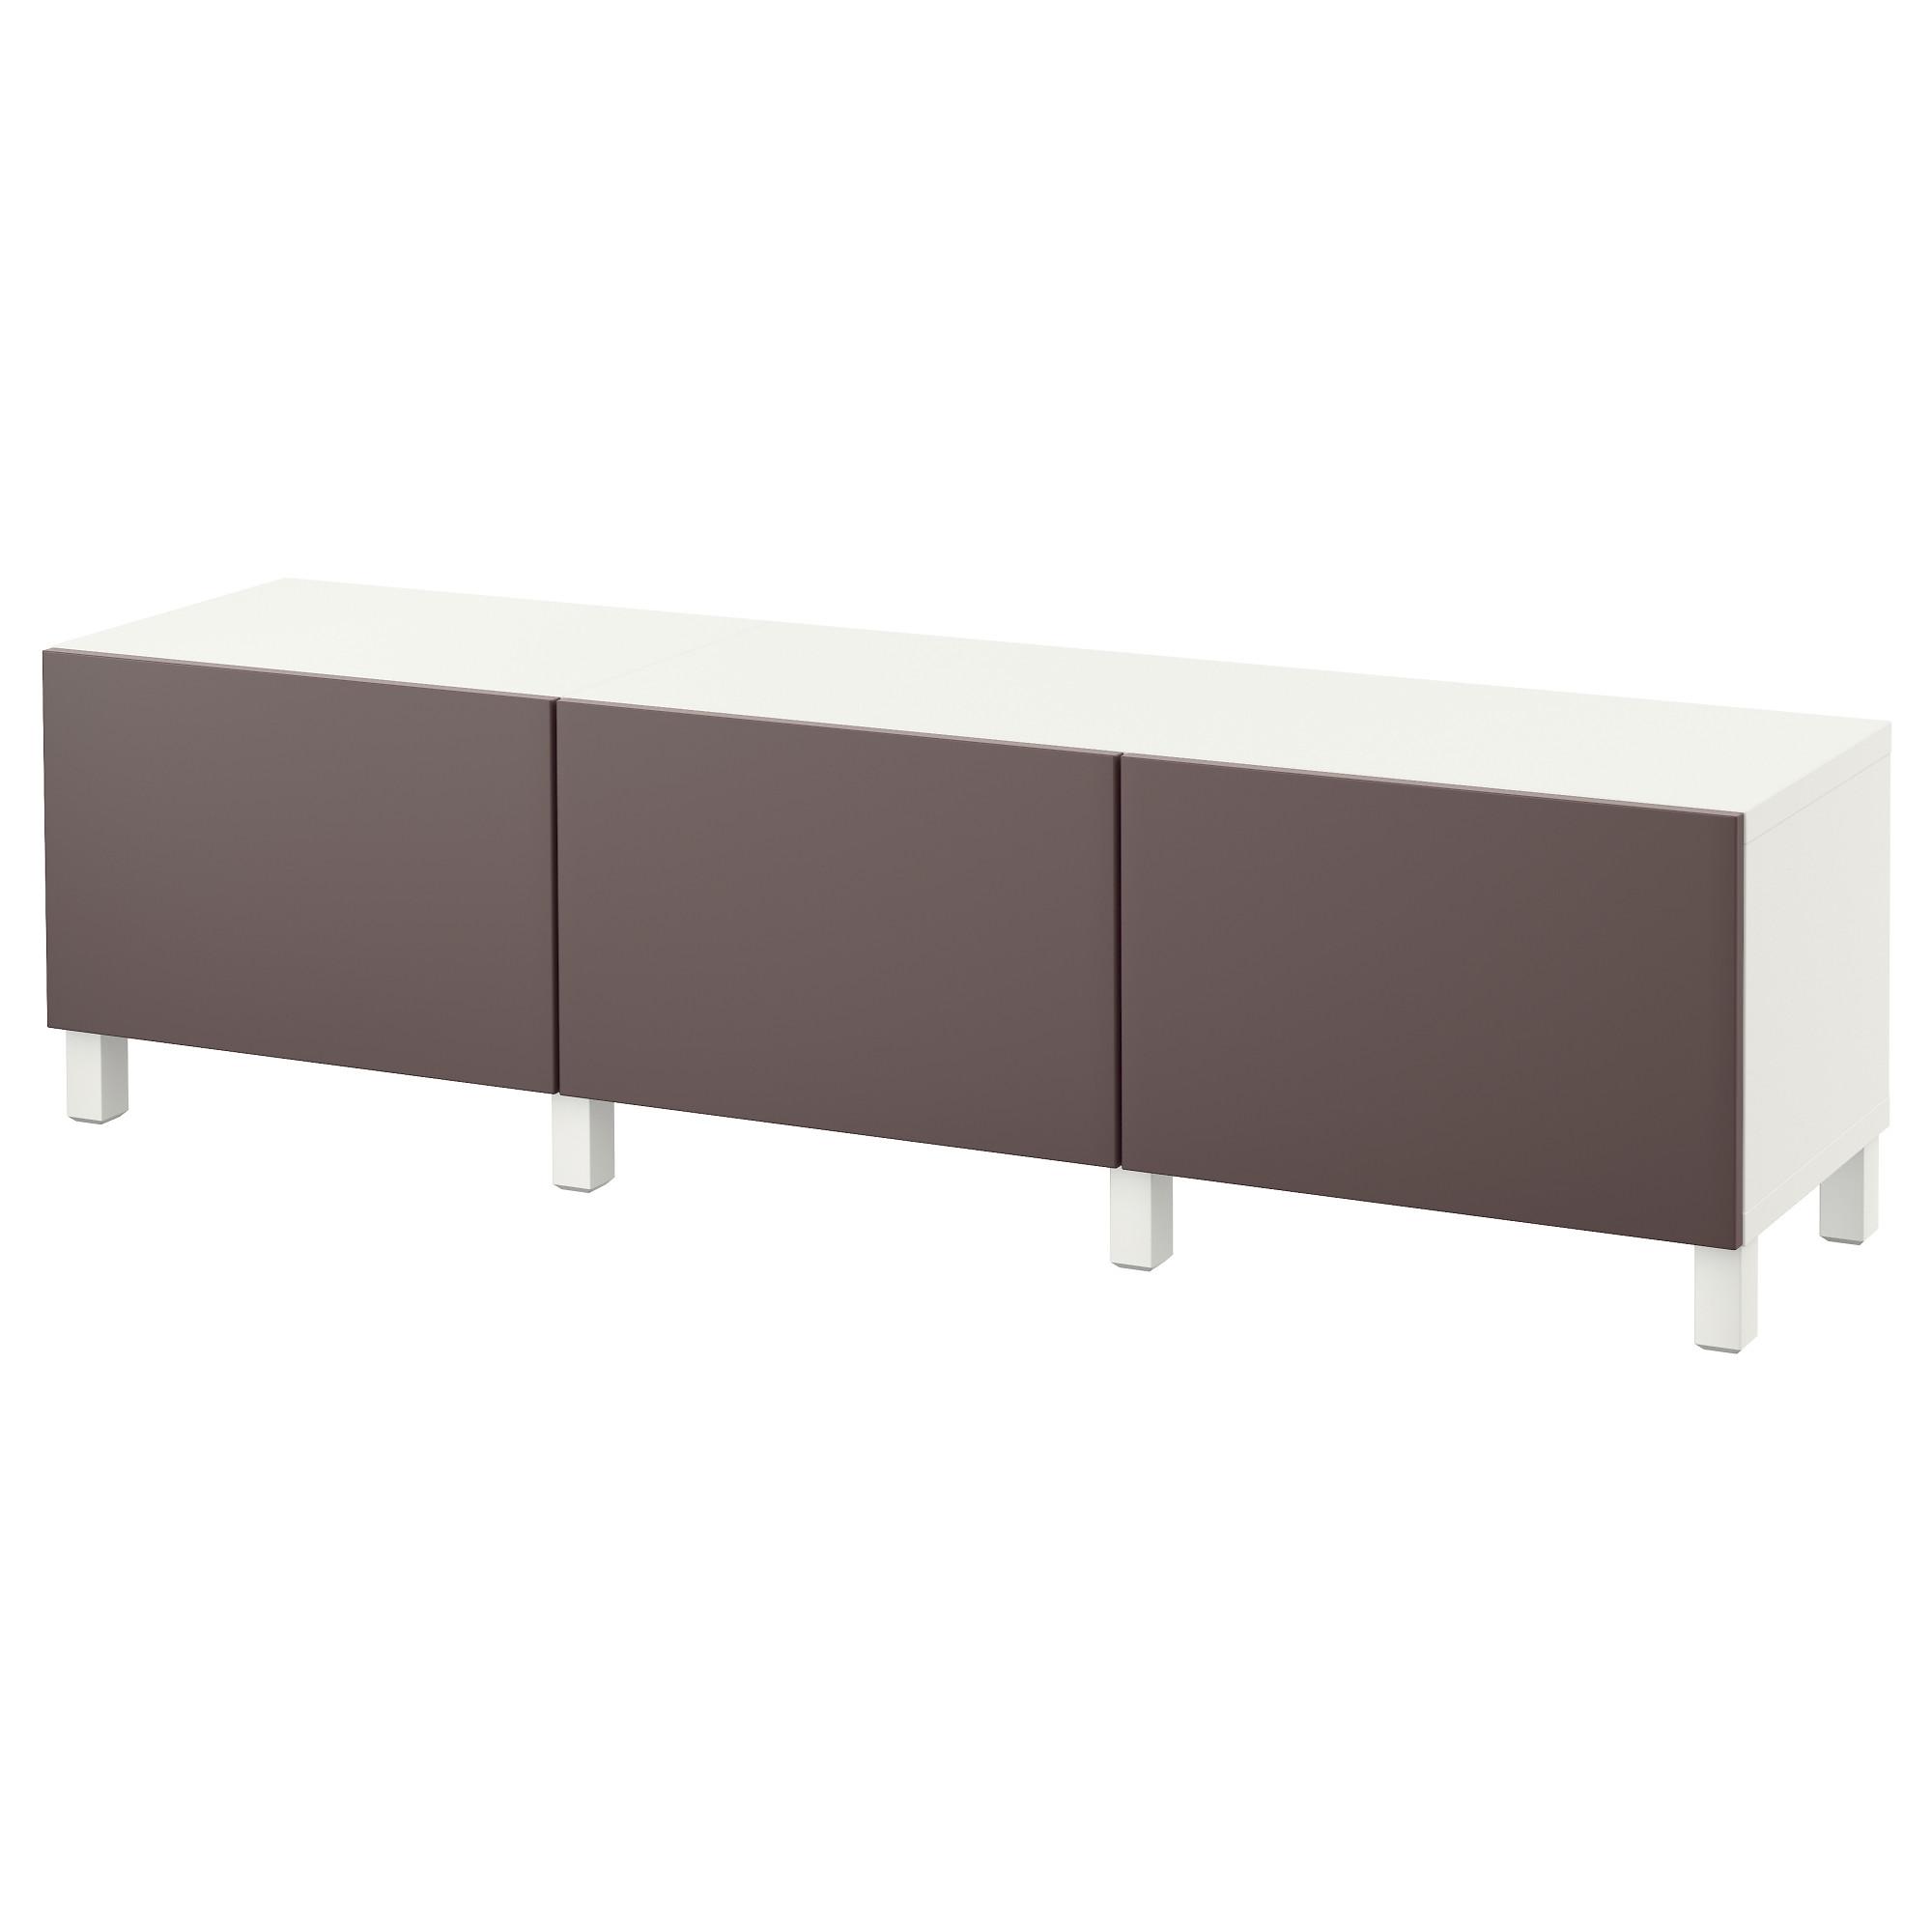 Комбинация для хранения с ящиками БЕСТО темно-коричневый артикуль № 891.364.96 в наличии. Онлайн сайт IKEA РБ. Быстрая доставка и монтаж.